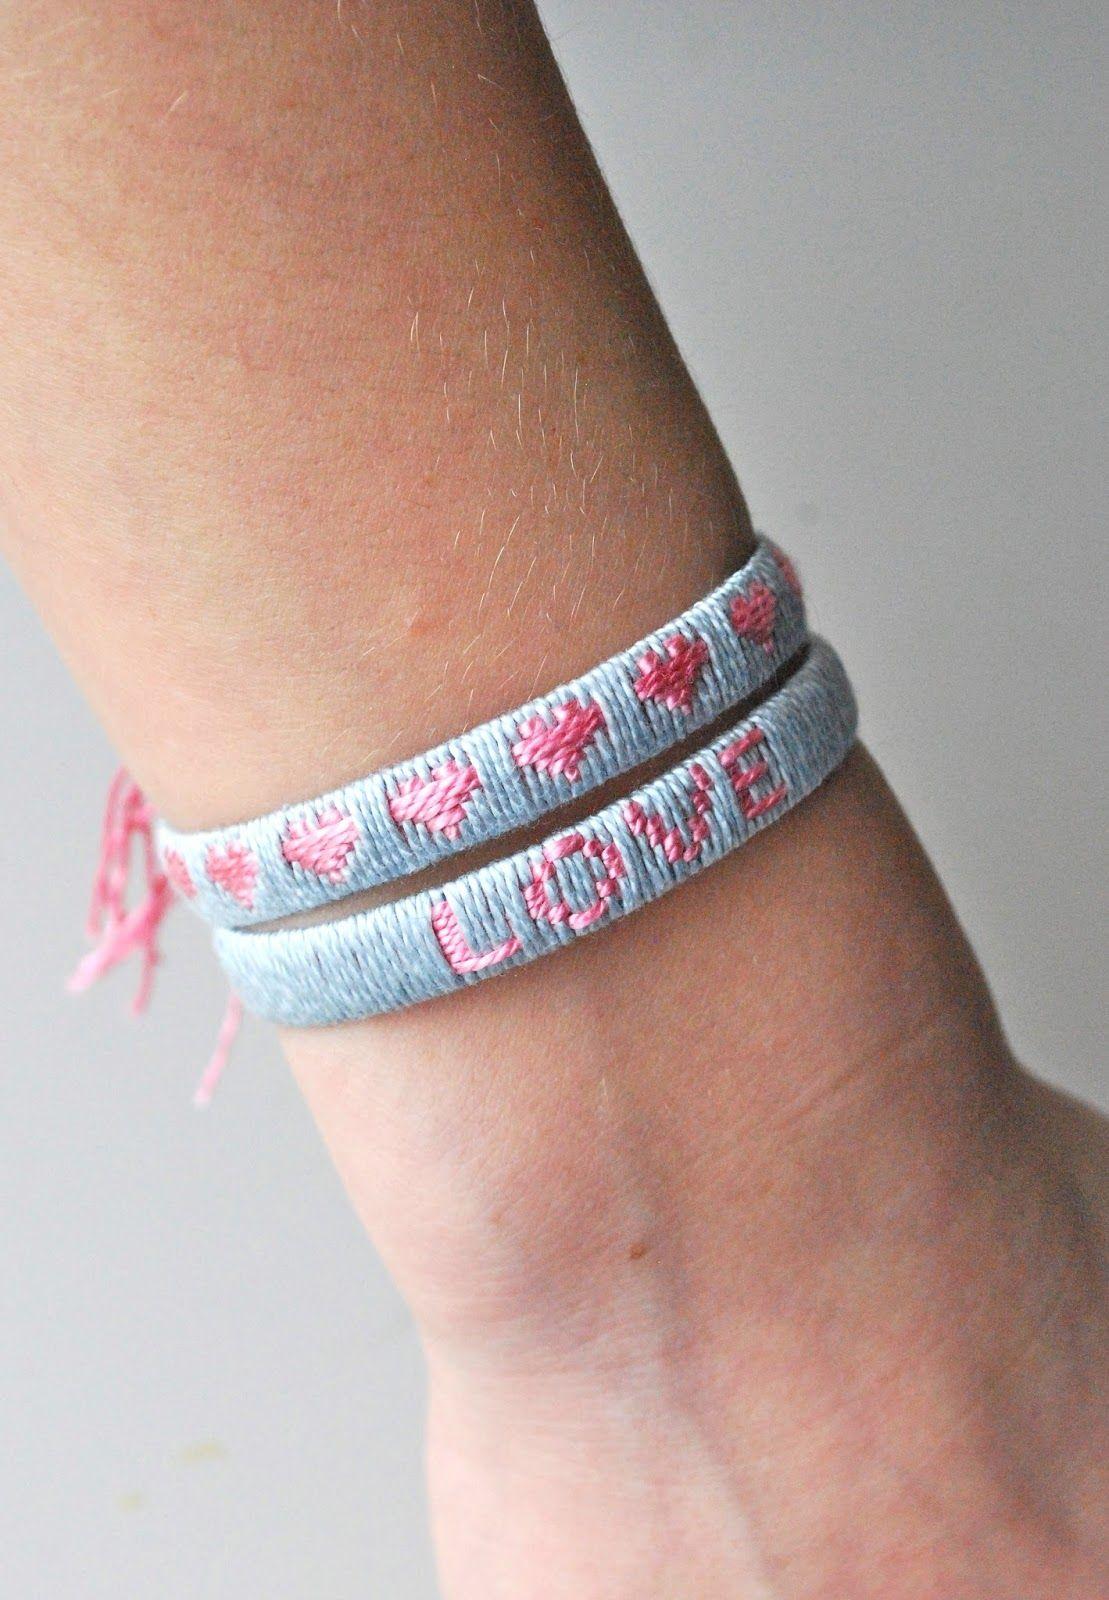 Armband Mit Botschaft Mamas Kram Macramé Armbänder